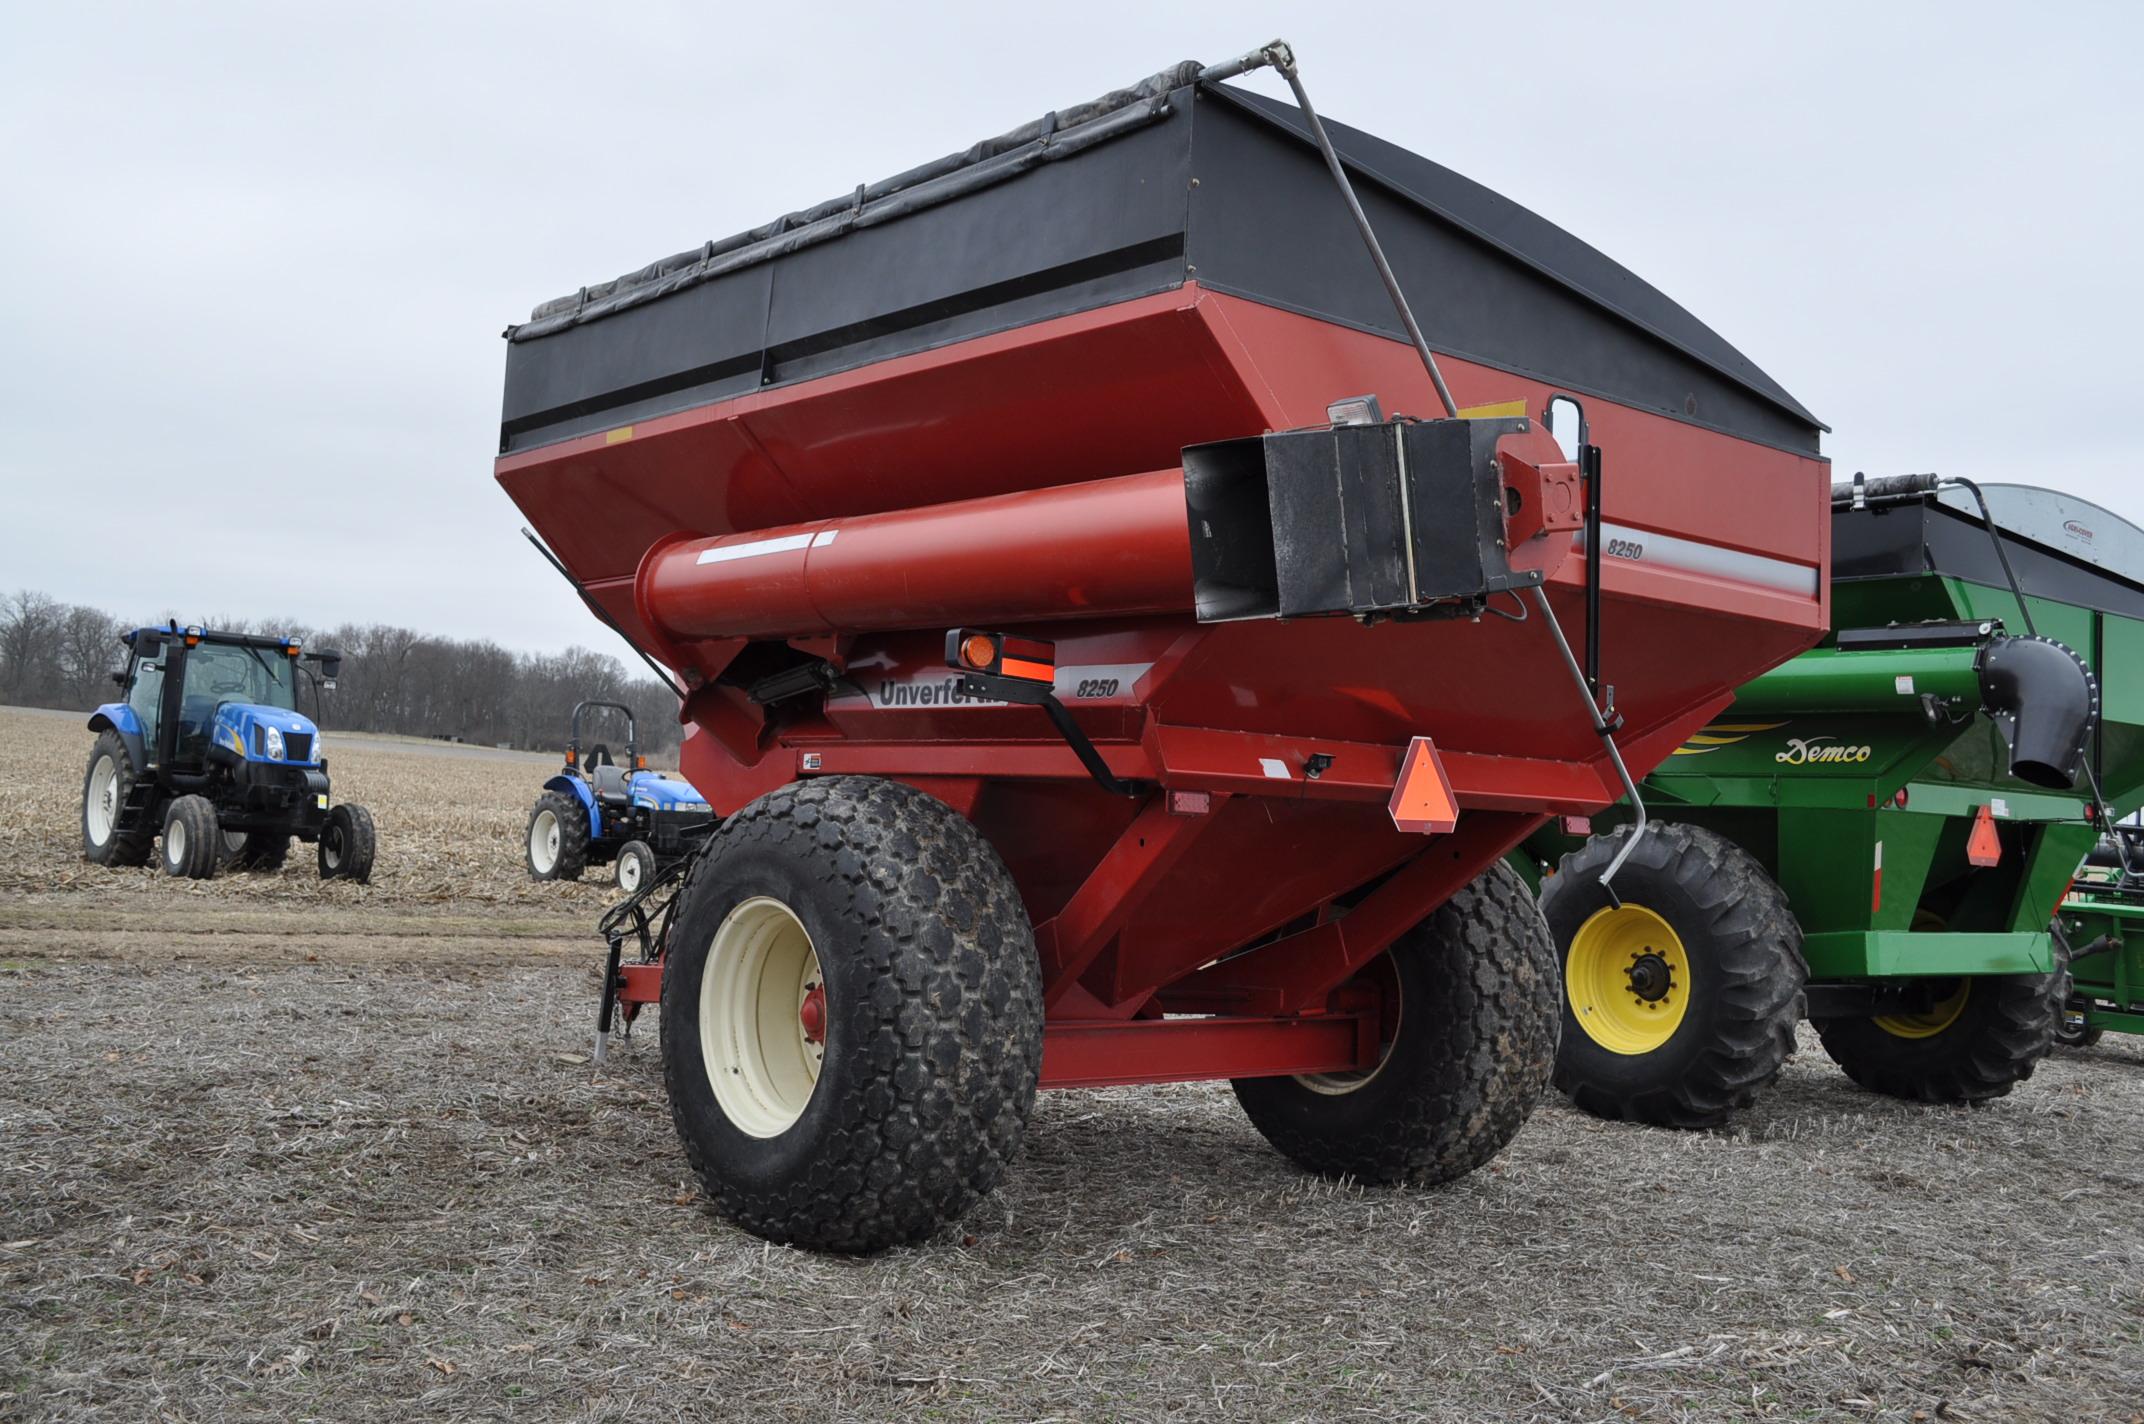 Unverferth 8250 grain cart, corner auger, 30.5L-32 diamond tread tires, lights, roll tarp, hyd - Image 2 of 11